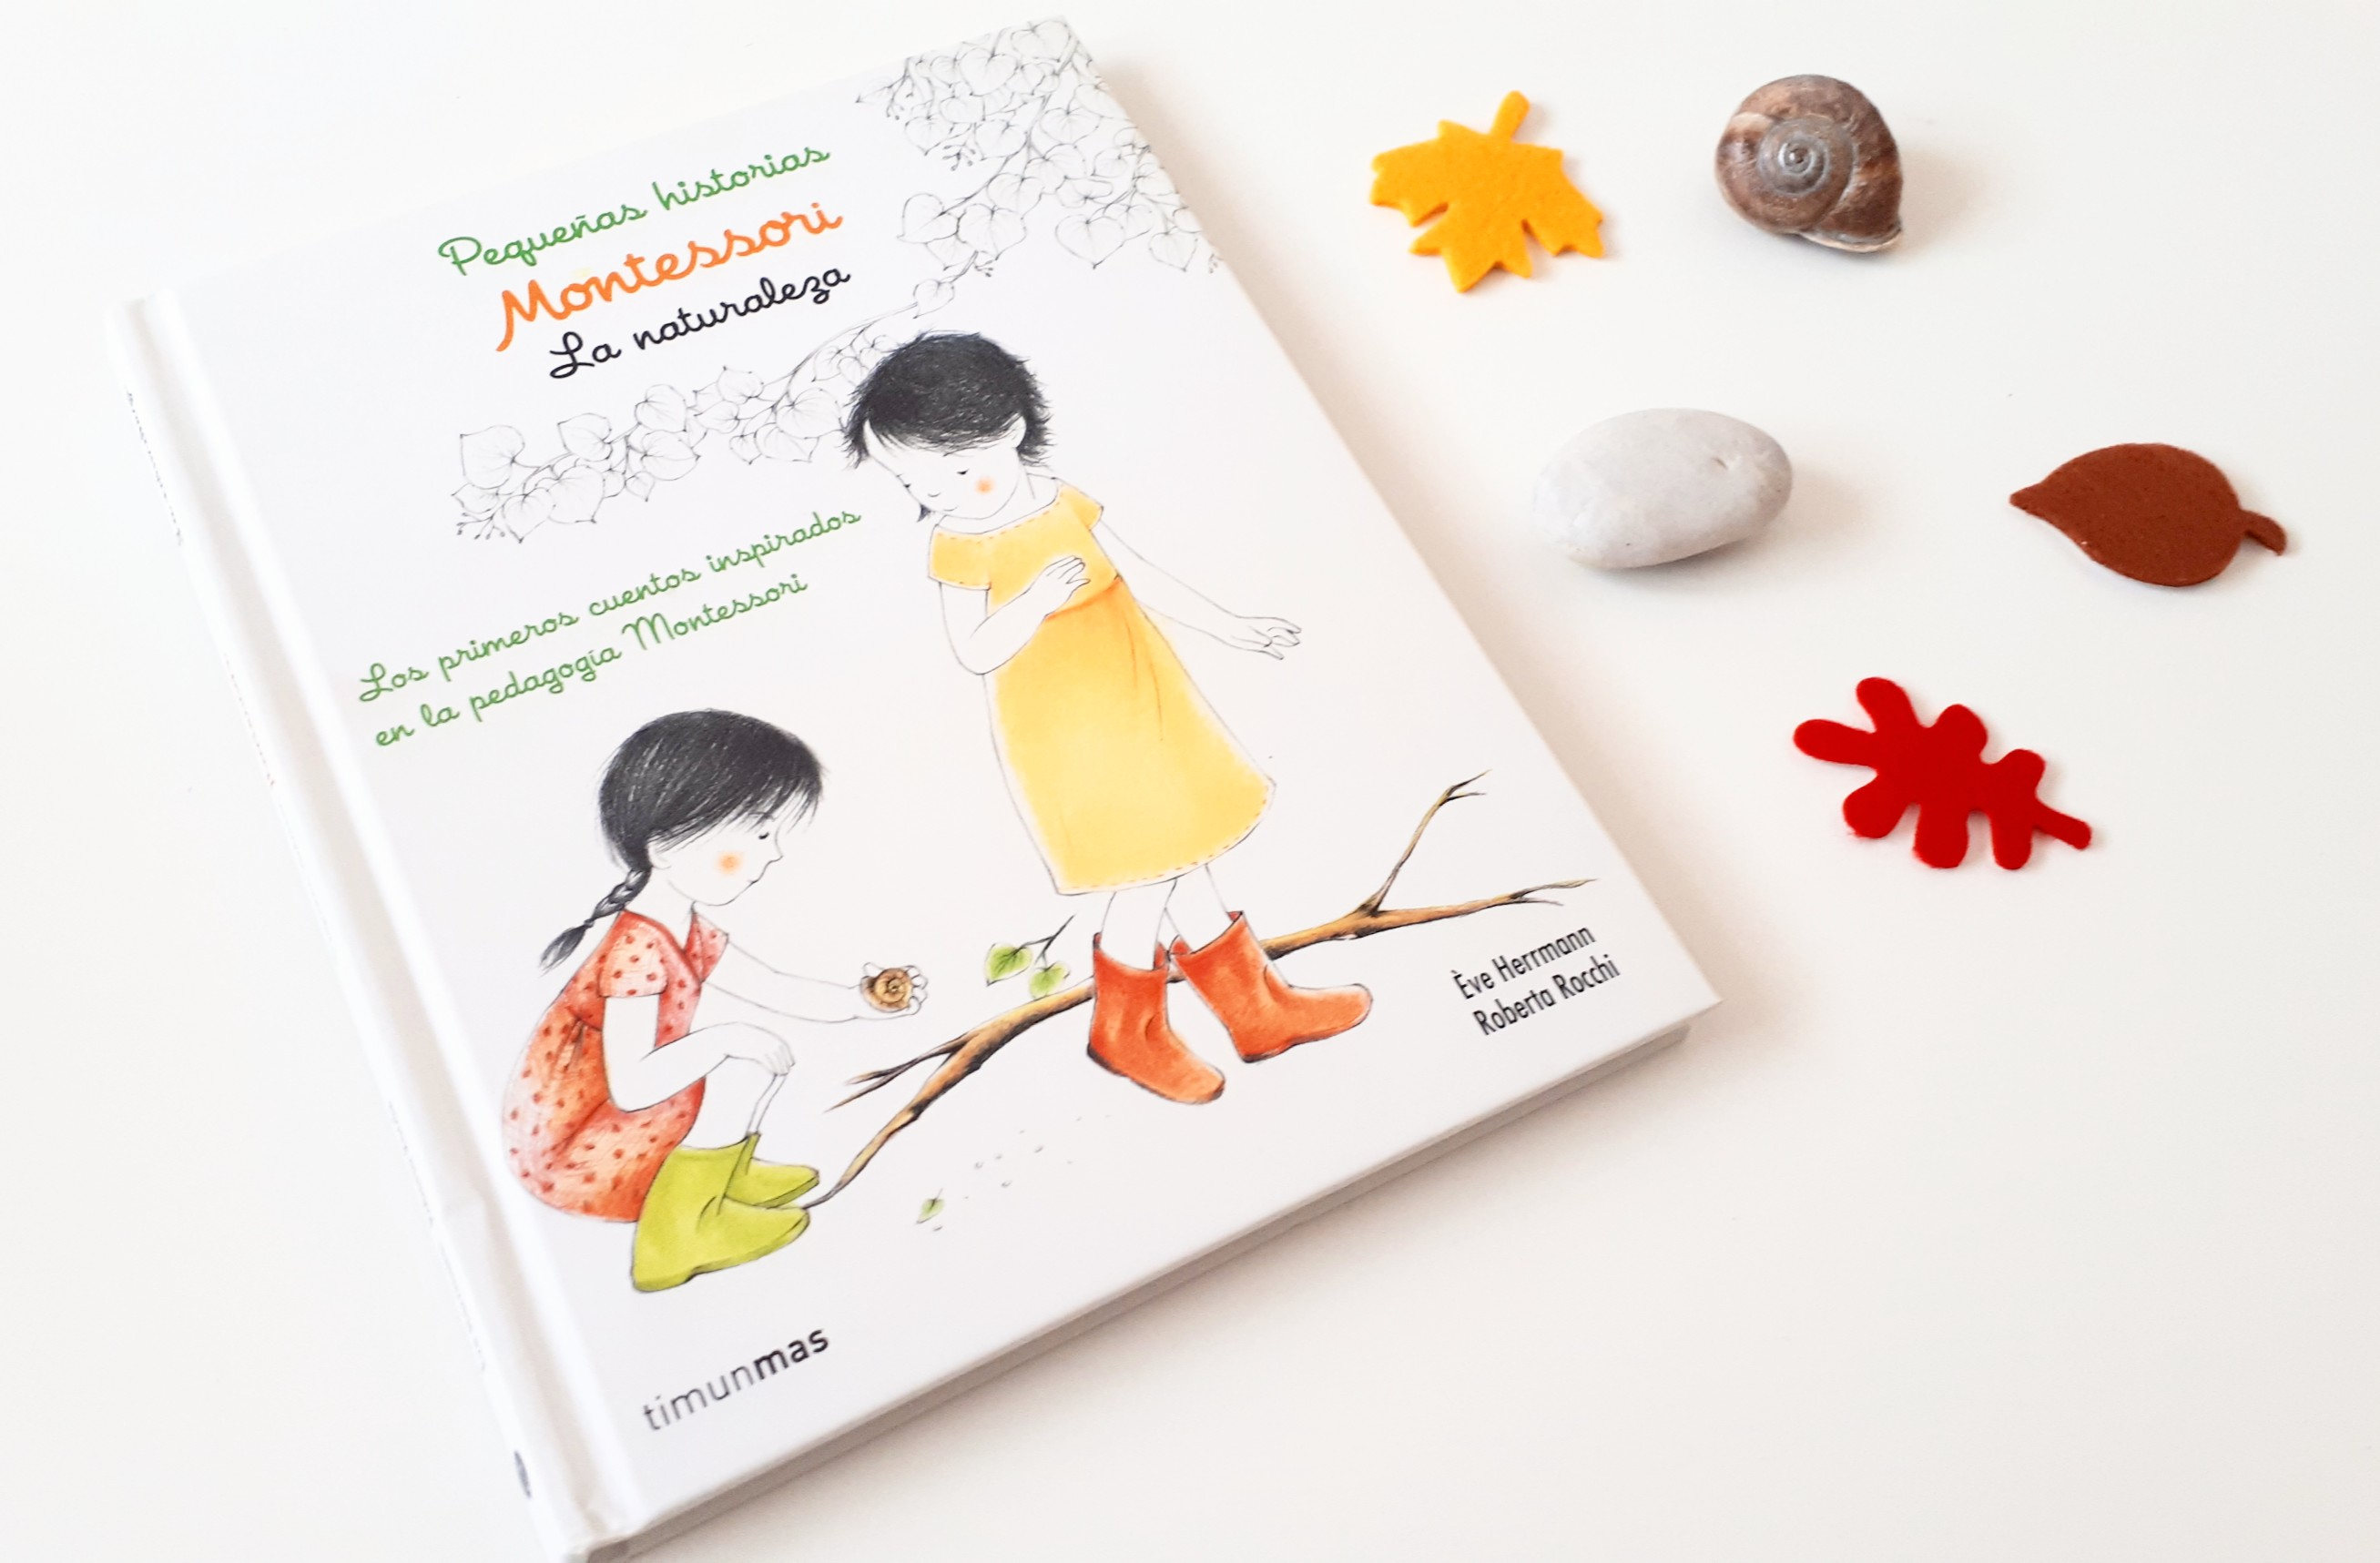 historias montessori Éve herrmann